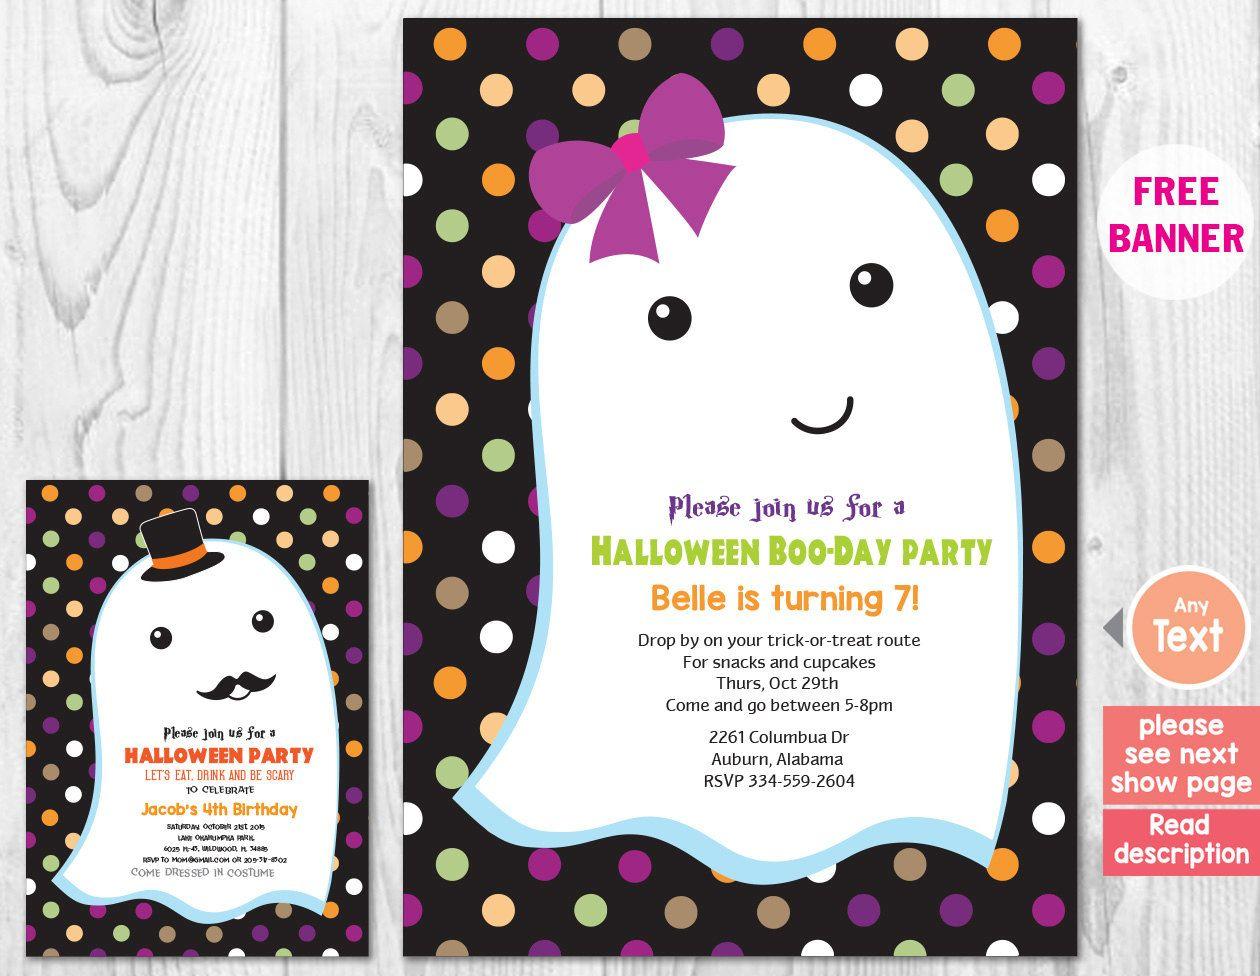 Costume Party Invitations Free Printable - theminecraftserver.com ...